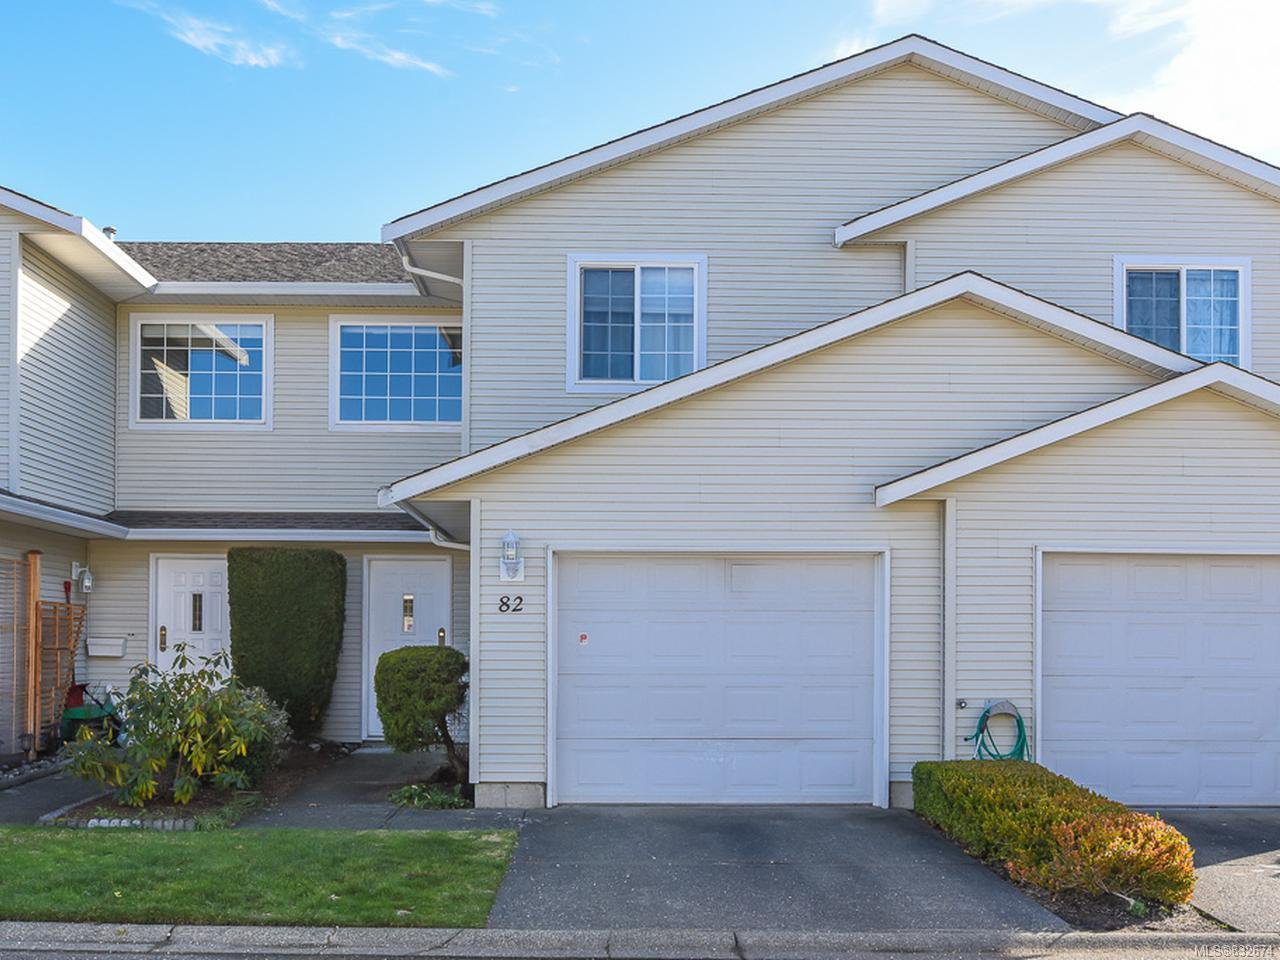 Main Photo: 82 717 Aspen Rd in COMOX: CV Comox (Town of) Row/Townhouse for sale (Comox Valley)  : MLS®# 832674